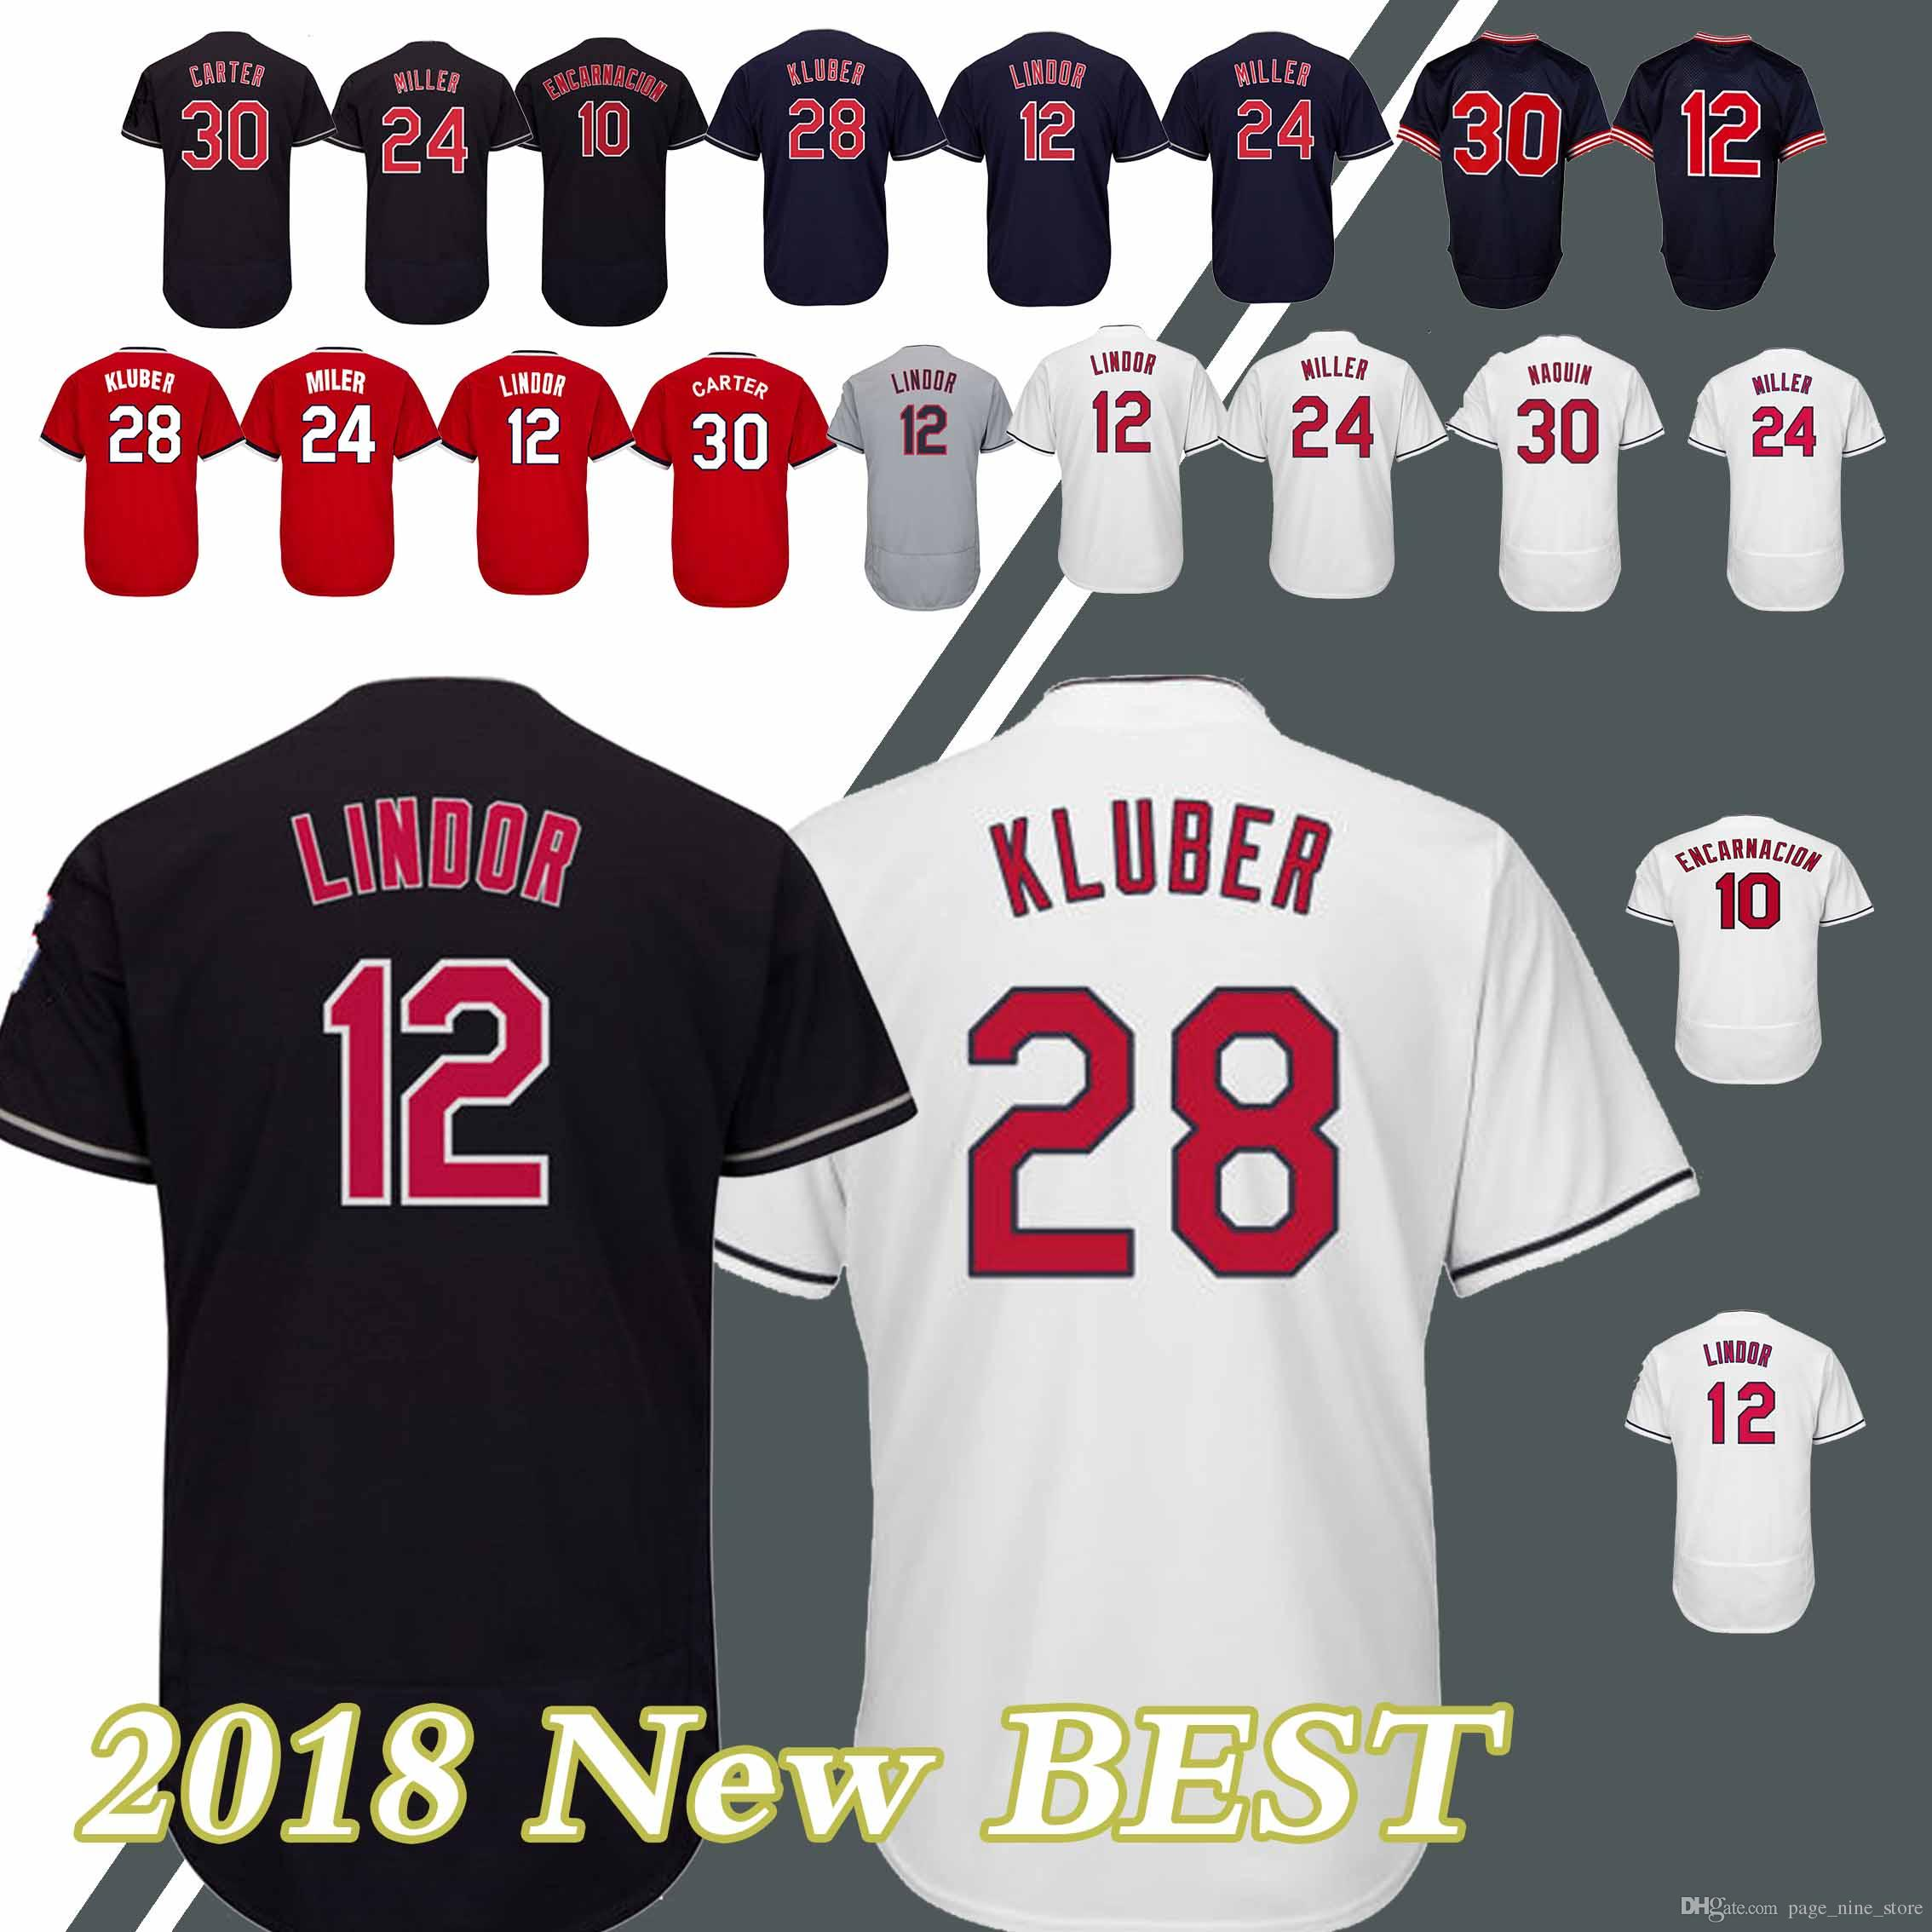 88a7cf327d4 Cleveland Indians Jerseys 10 Edwin Encarnacion 30 Joe Carter Hot ...